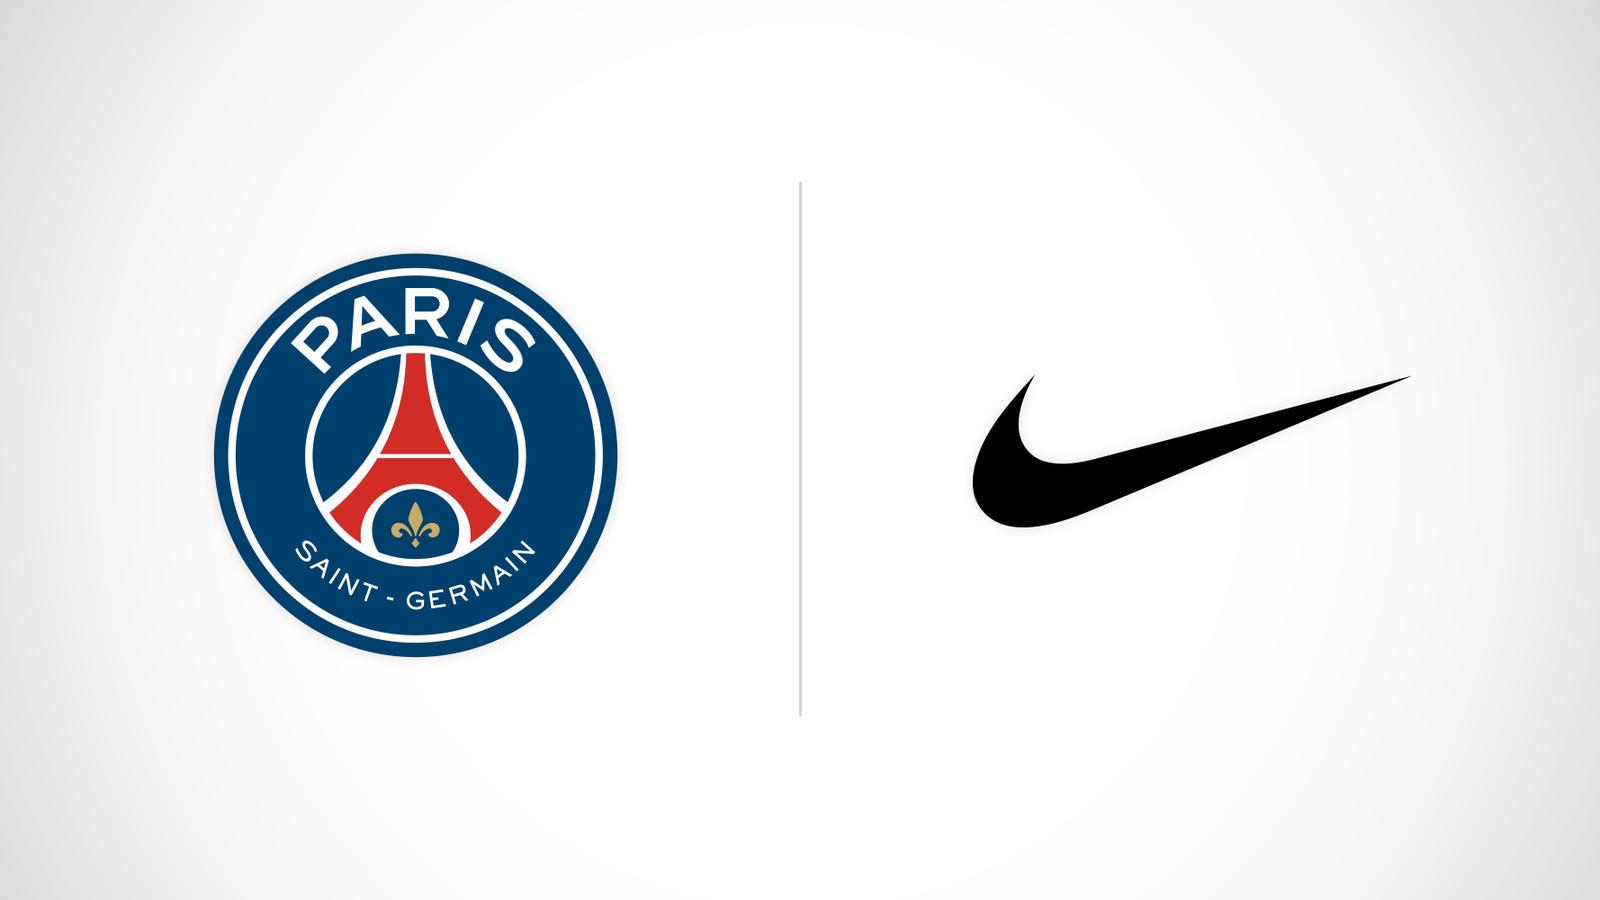 Nike And Paris Saint Germain Extend Partnership Until 2032